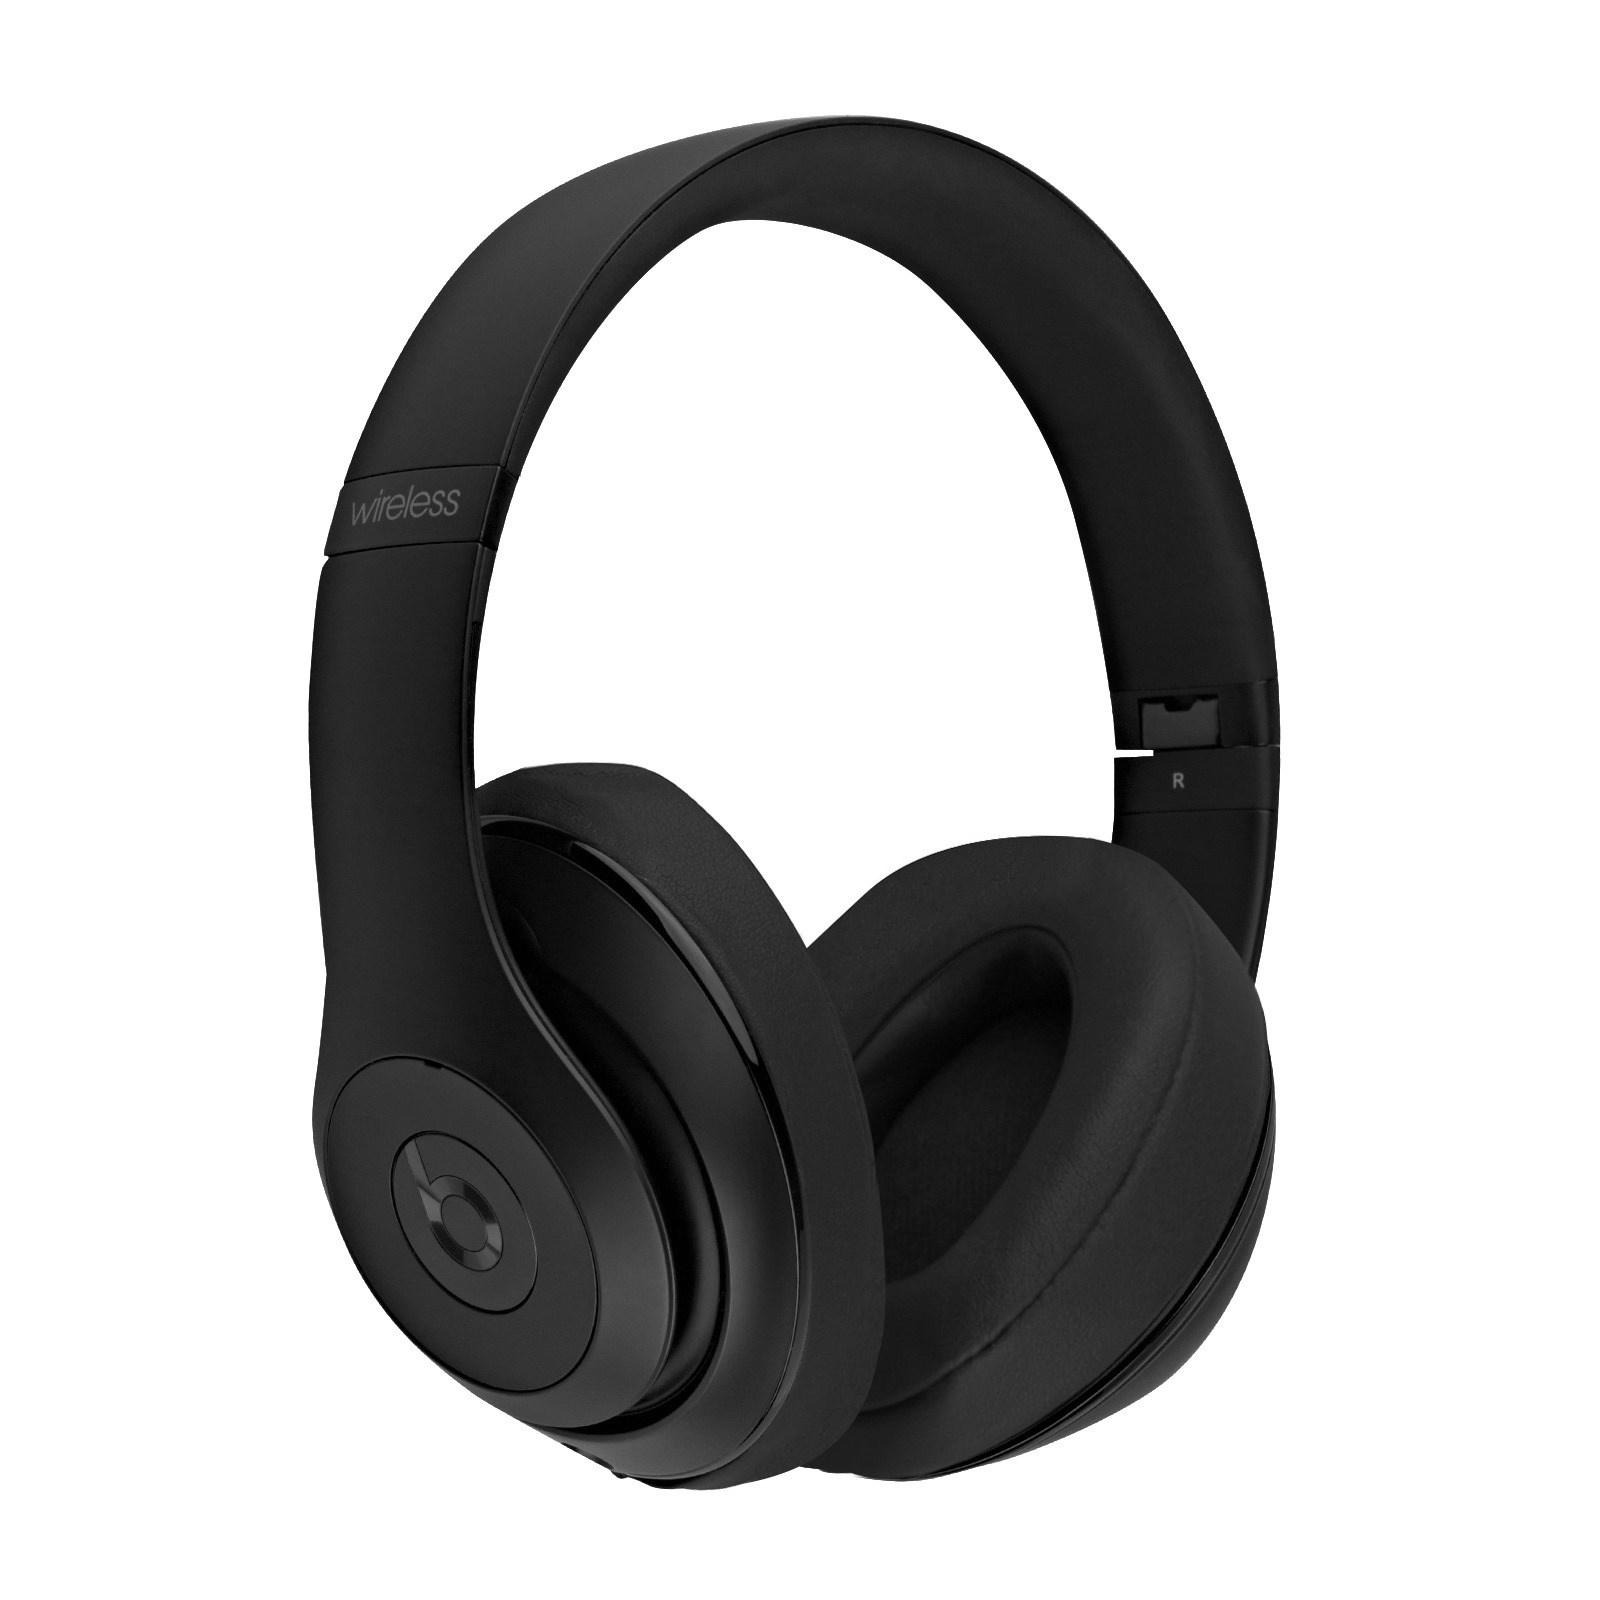 Bluetooth Studio Beats For Sale Bluetooth Motorcycle Helmet Icon Veho Kasa Bluetooth Smart Led Light Strip Bluetooth Adapter Usb: Beats By Dr. Dre Studio Wireless Over-Ear Bluetooth Noise